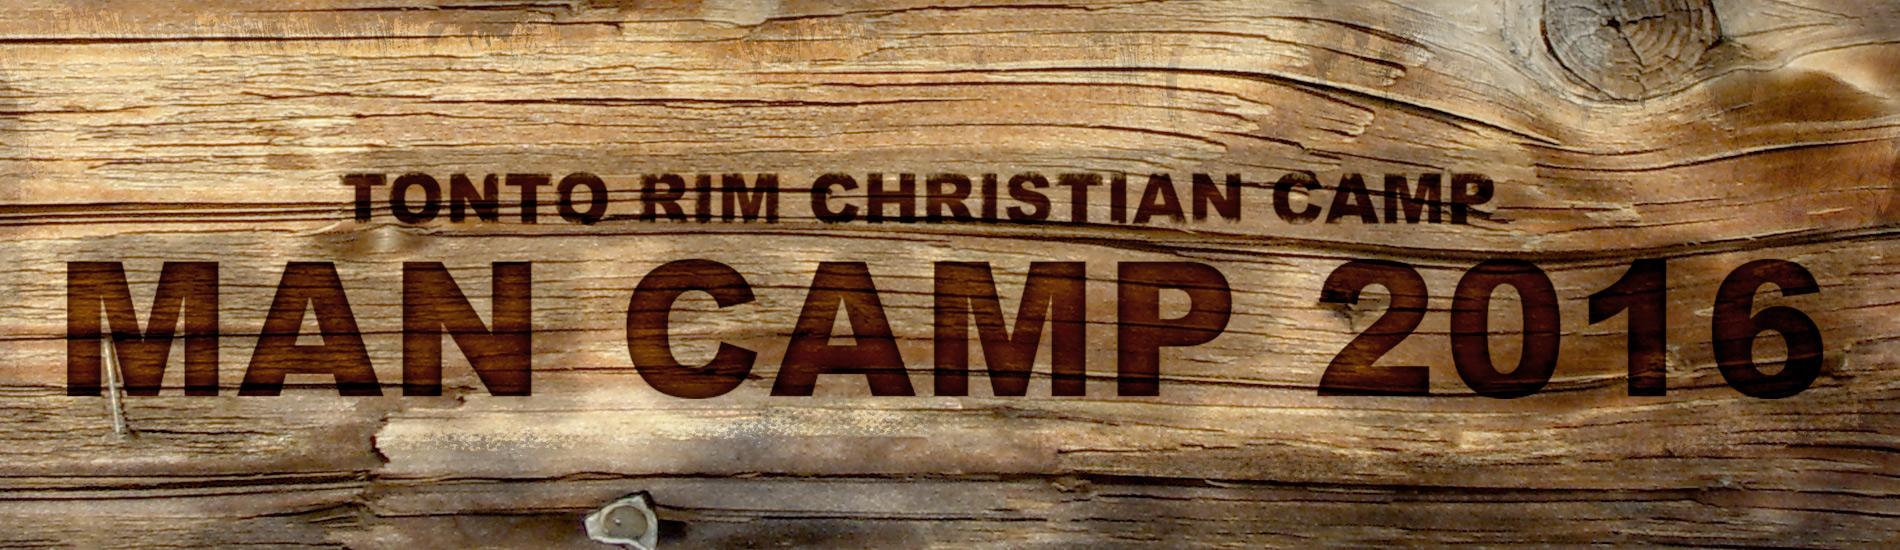 Man Camp 2015 Christian Mens Retreat